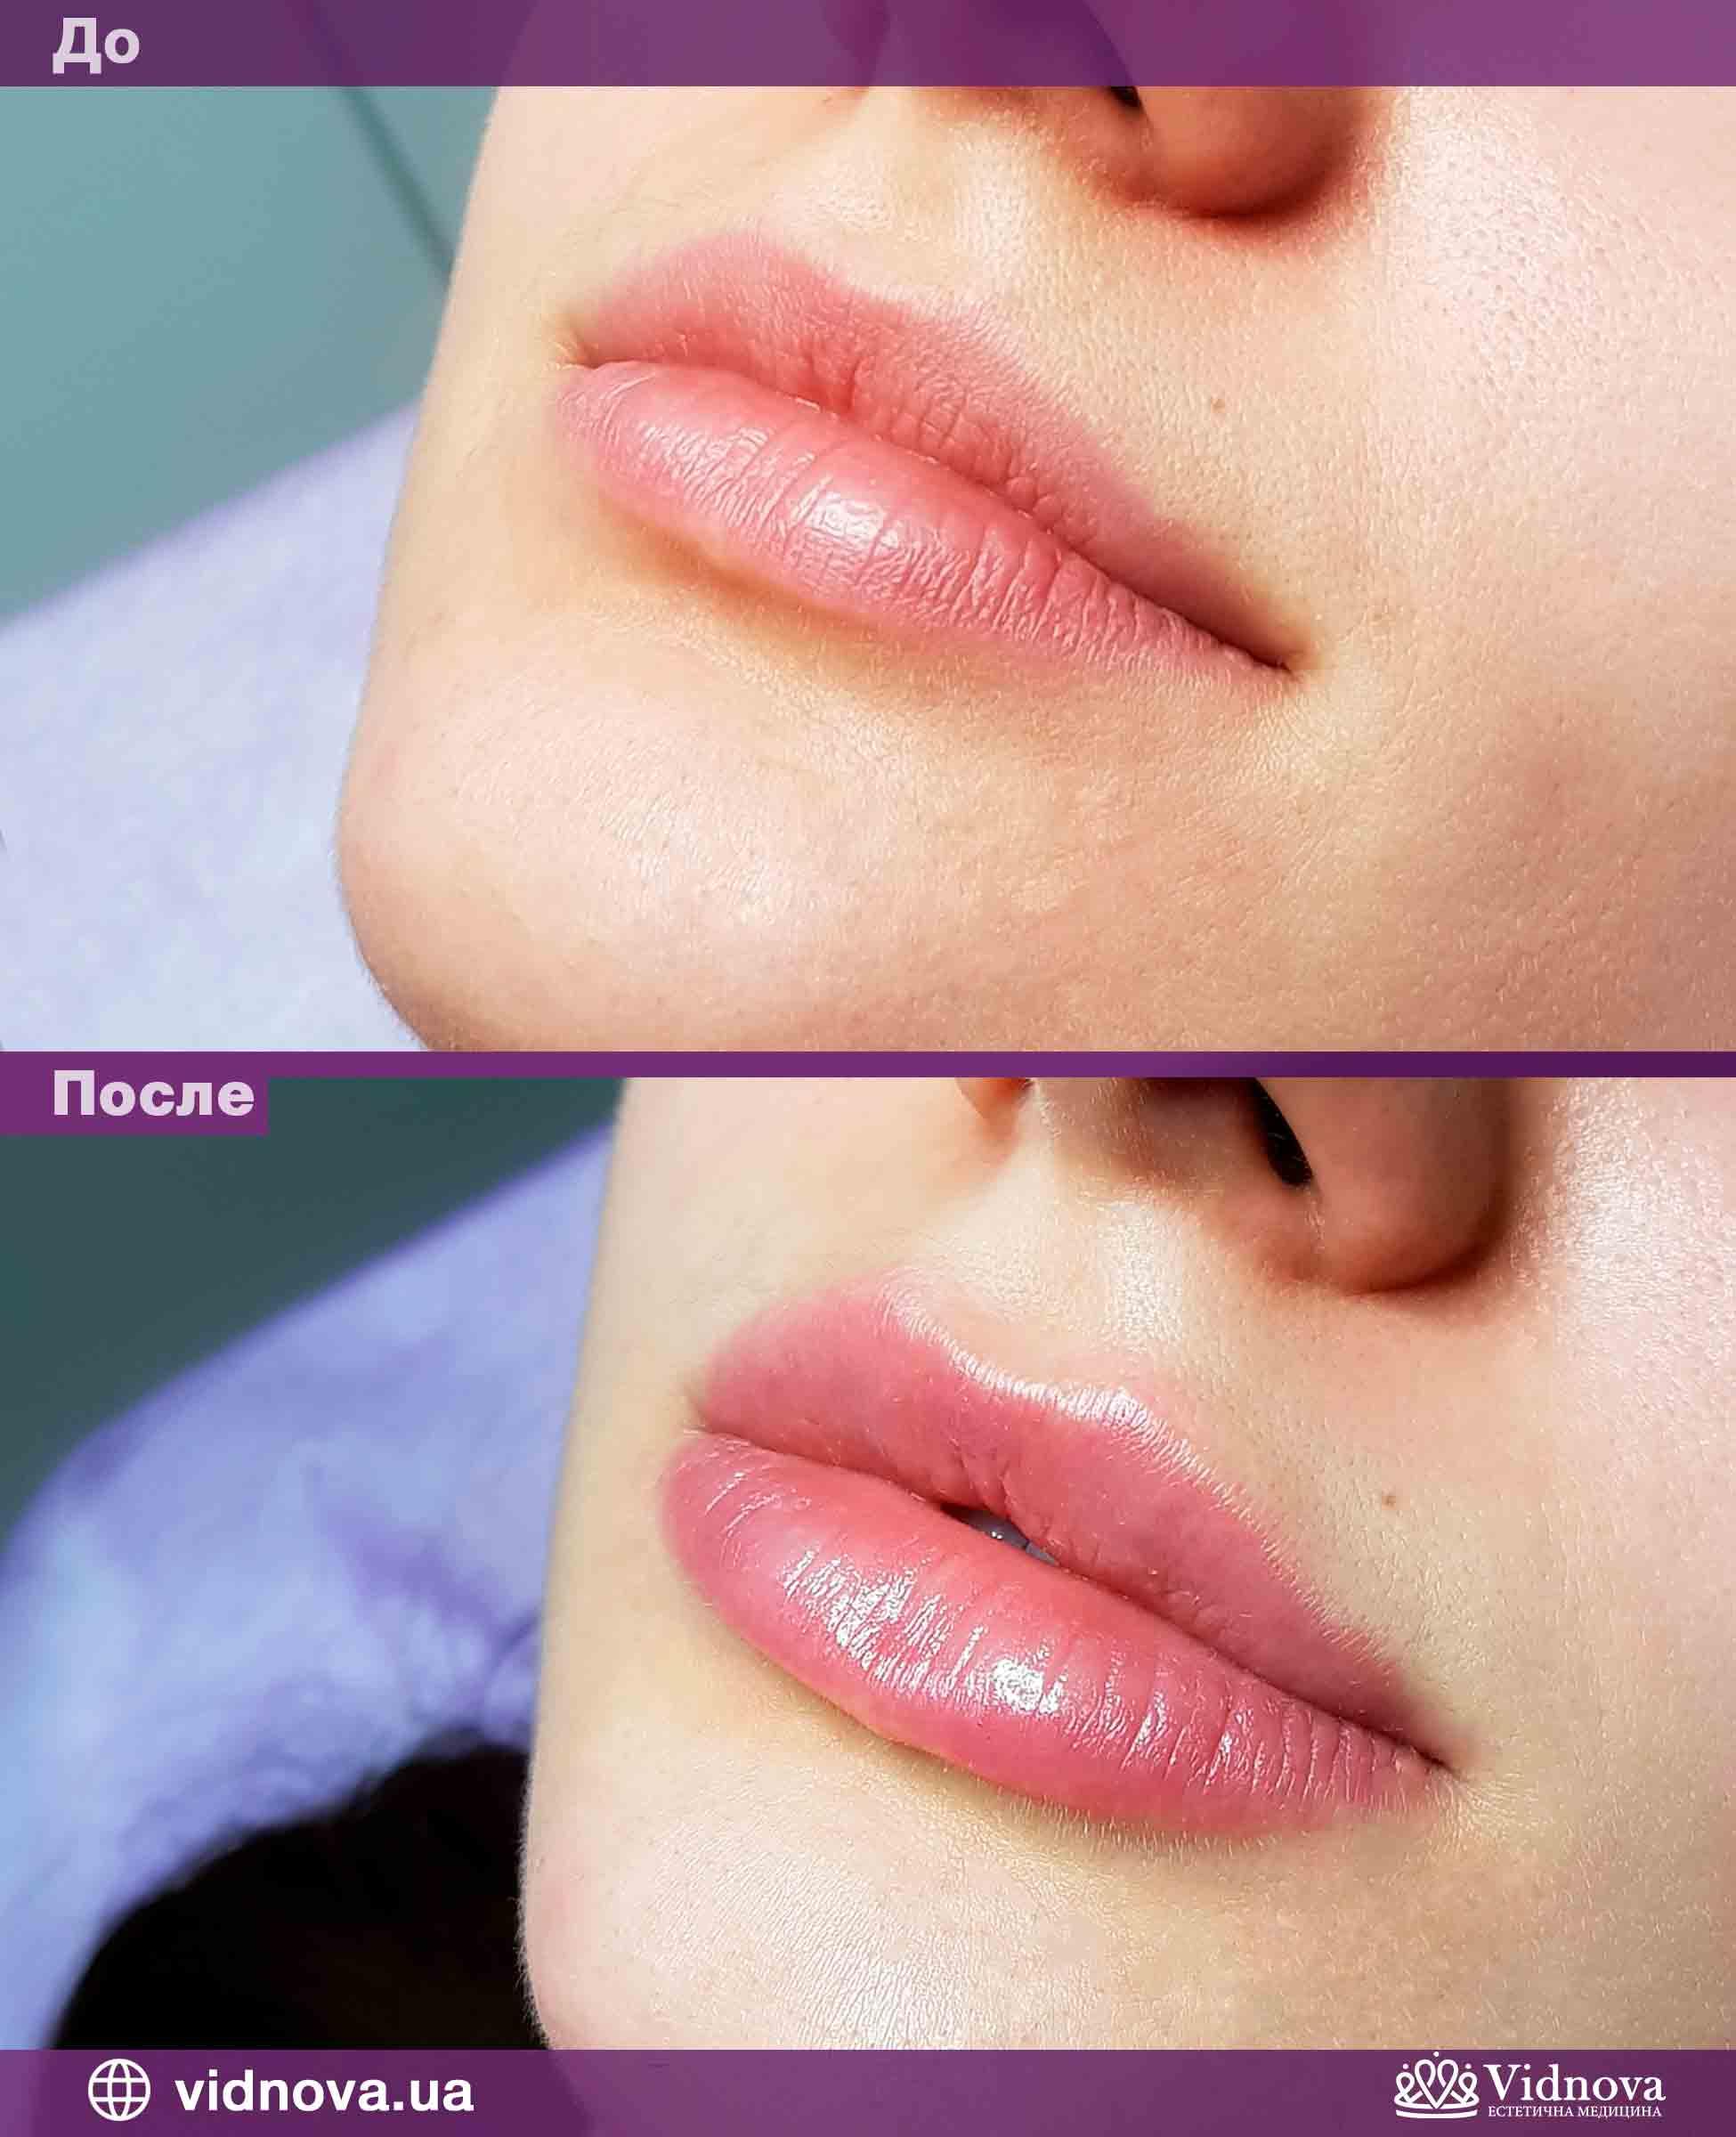 Увеличение губ: Фото До и После - Пример №6-1 - Клиника Vidnova